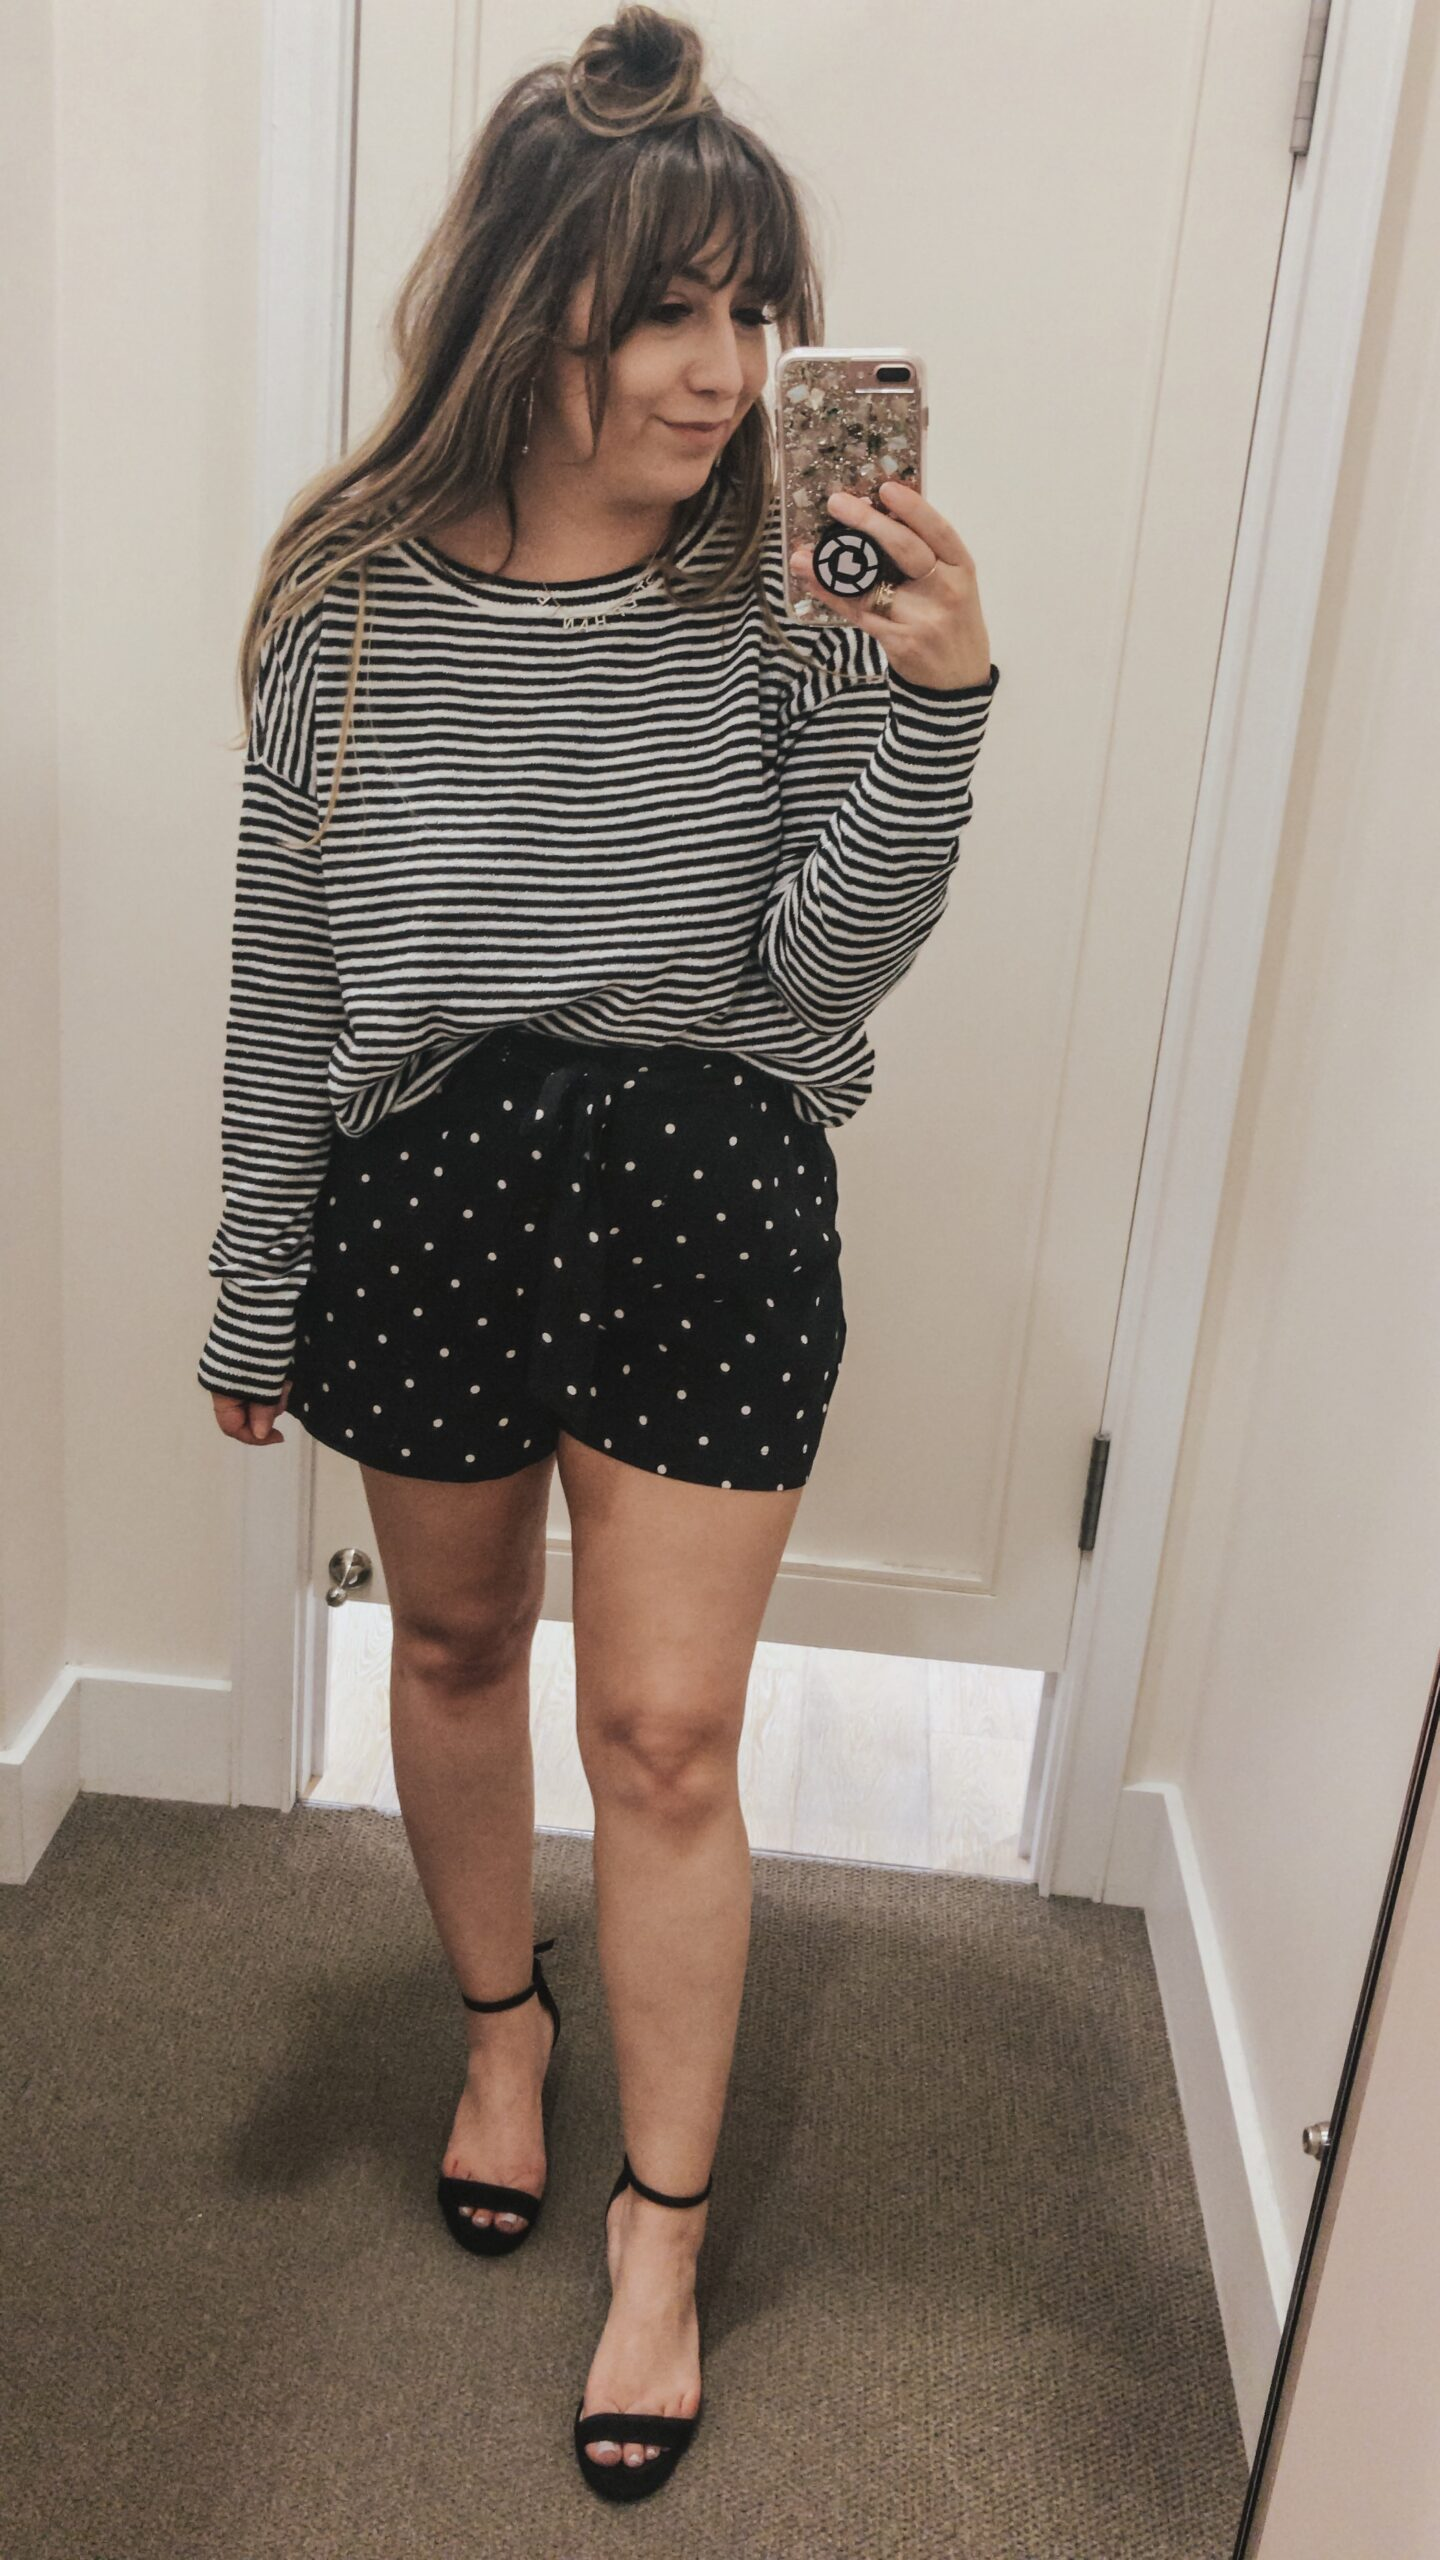 LOFT Spring - striped sweater and polka dot shorts